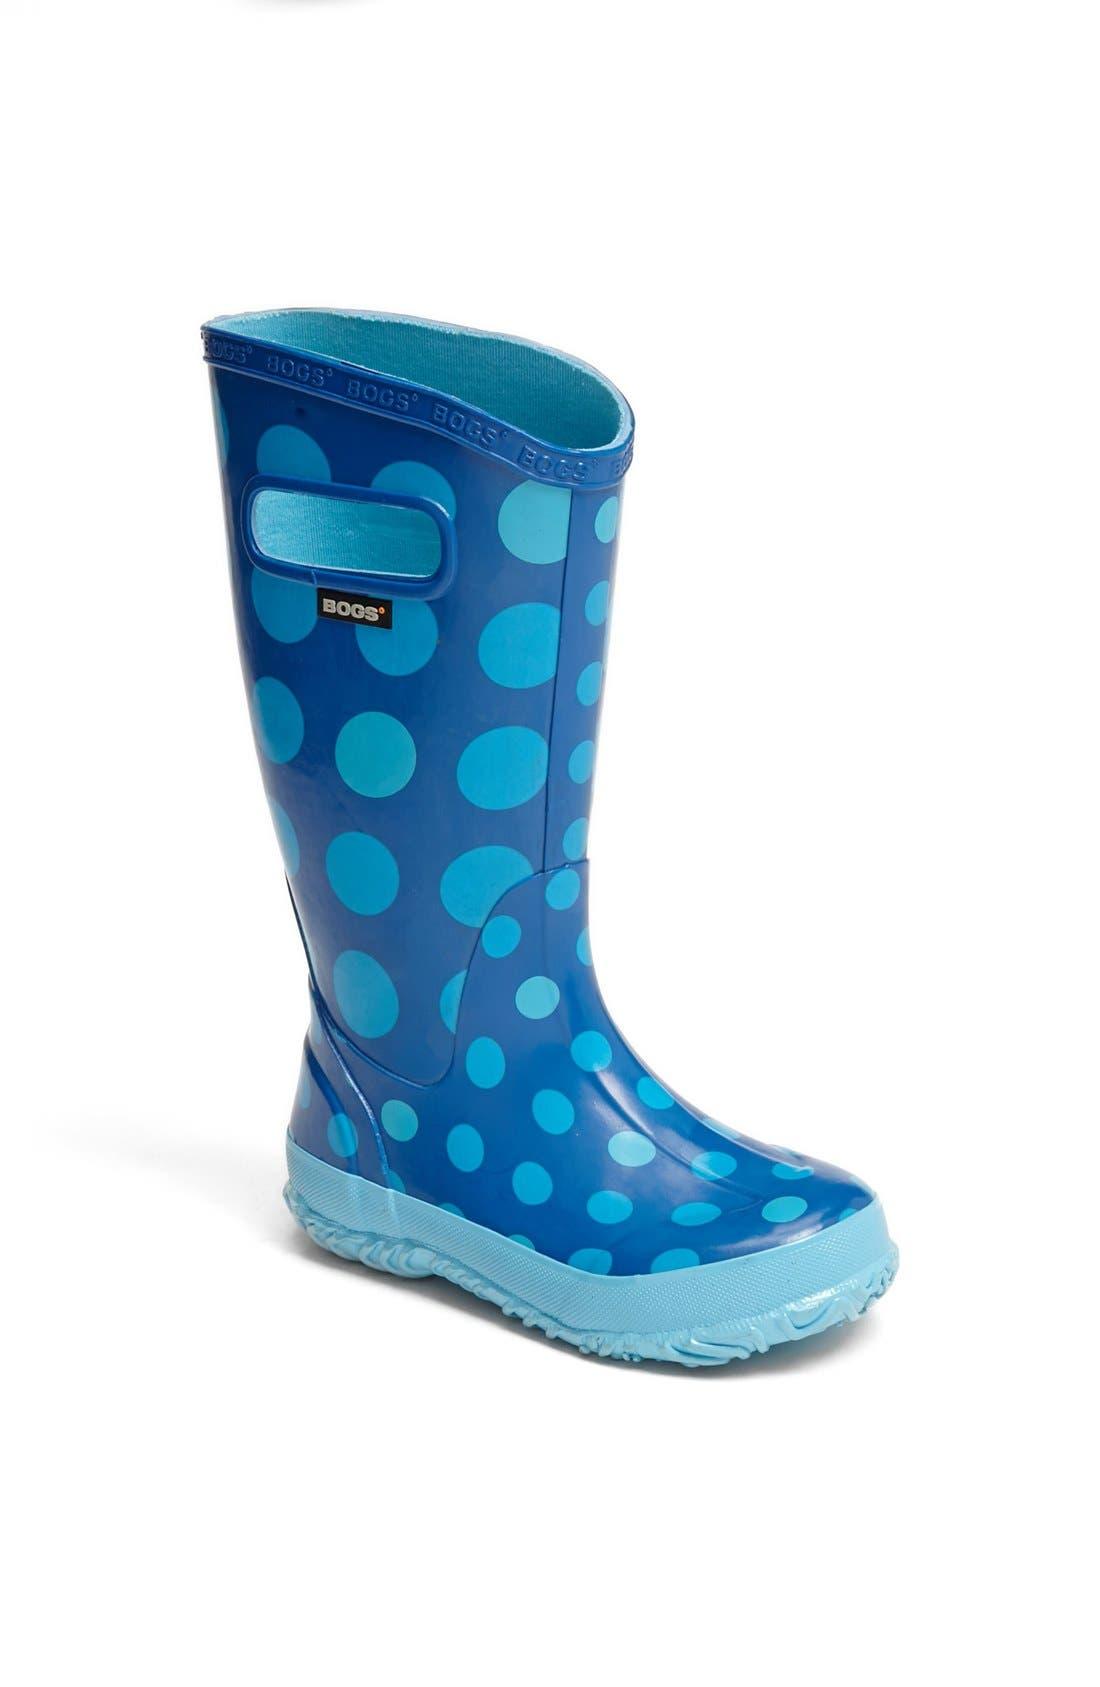 Main Image - Bogs 'Dots' Rain Boot (Walker, Toddler, Little Kid & Big Kid)